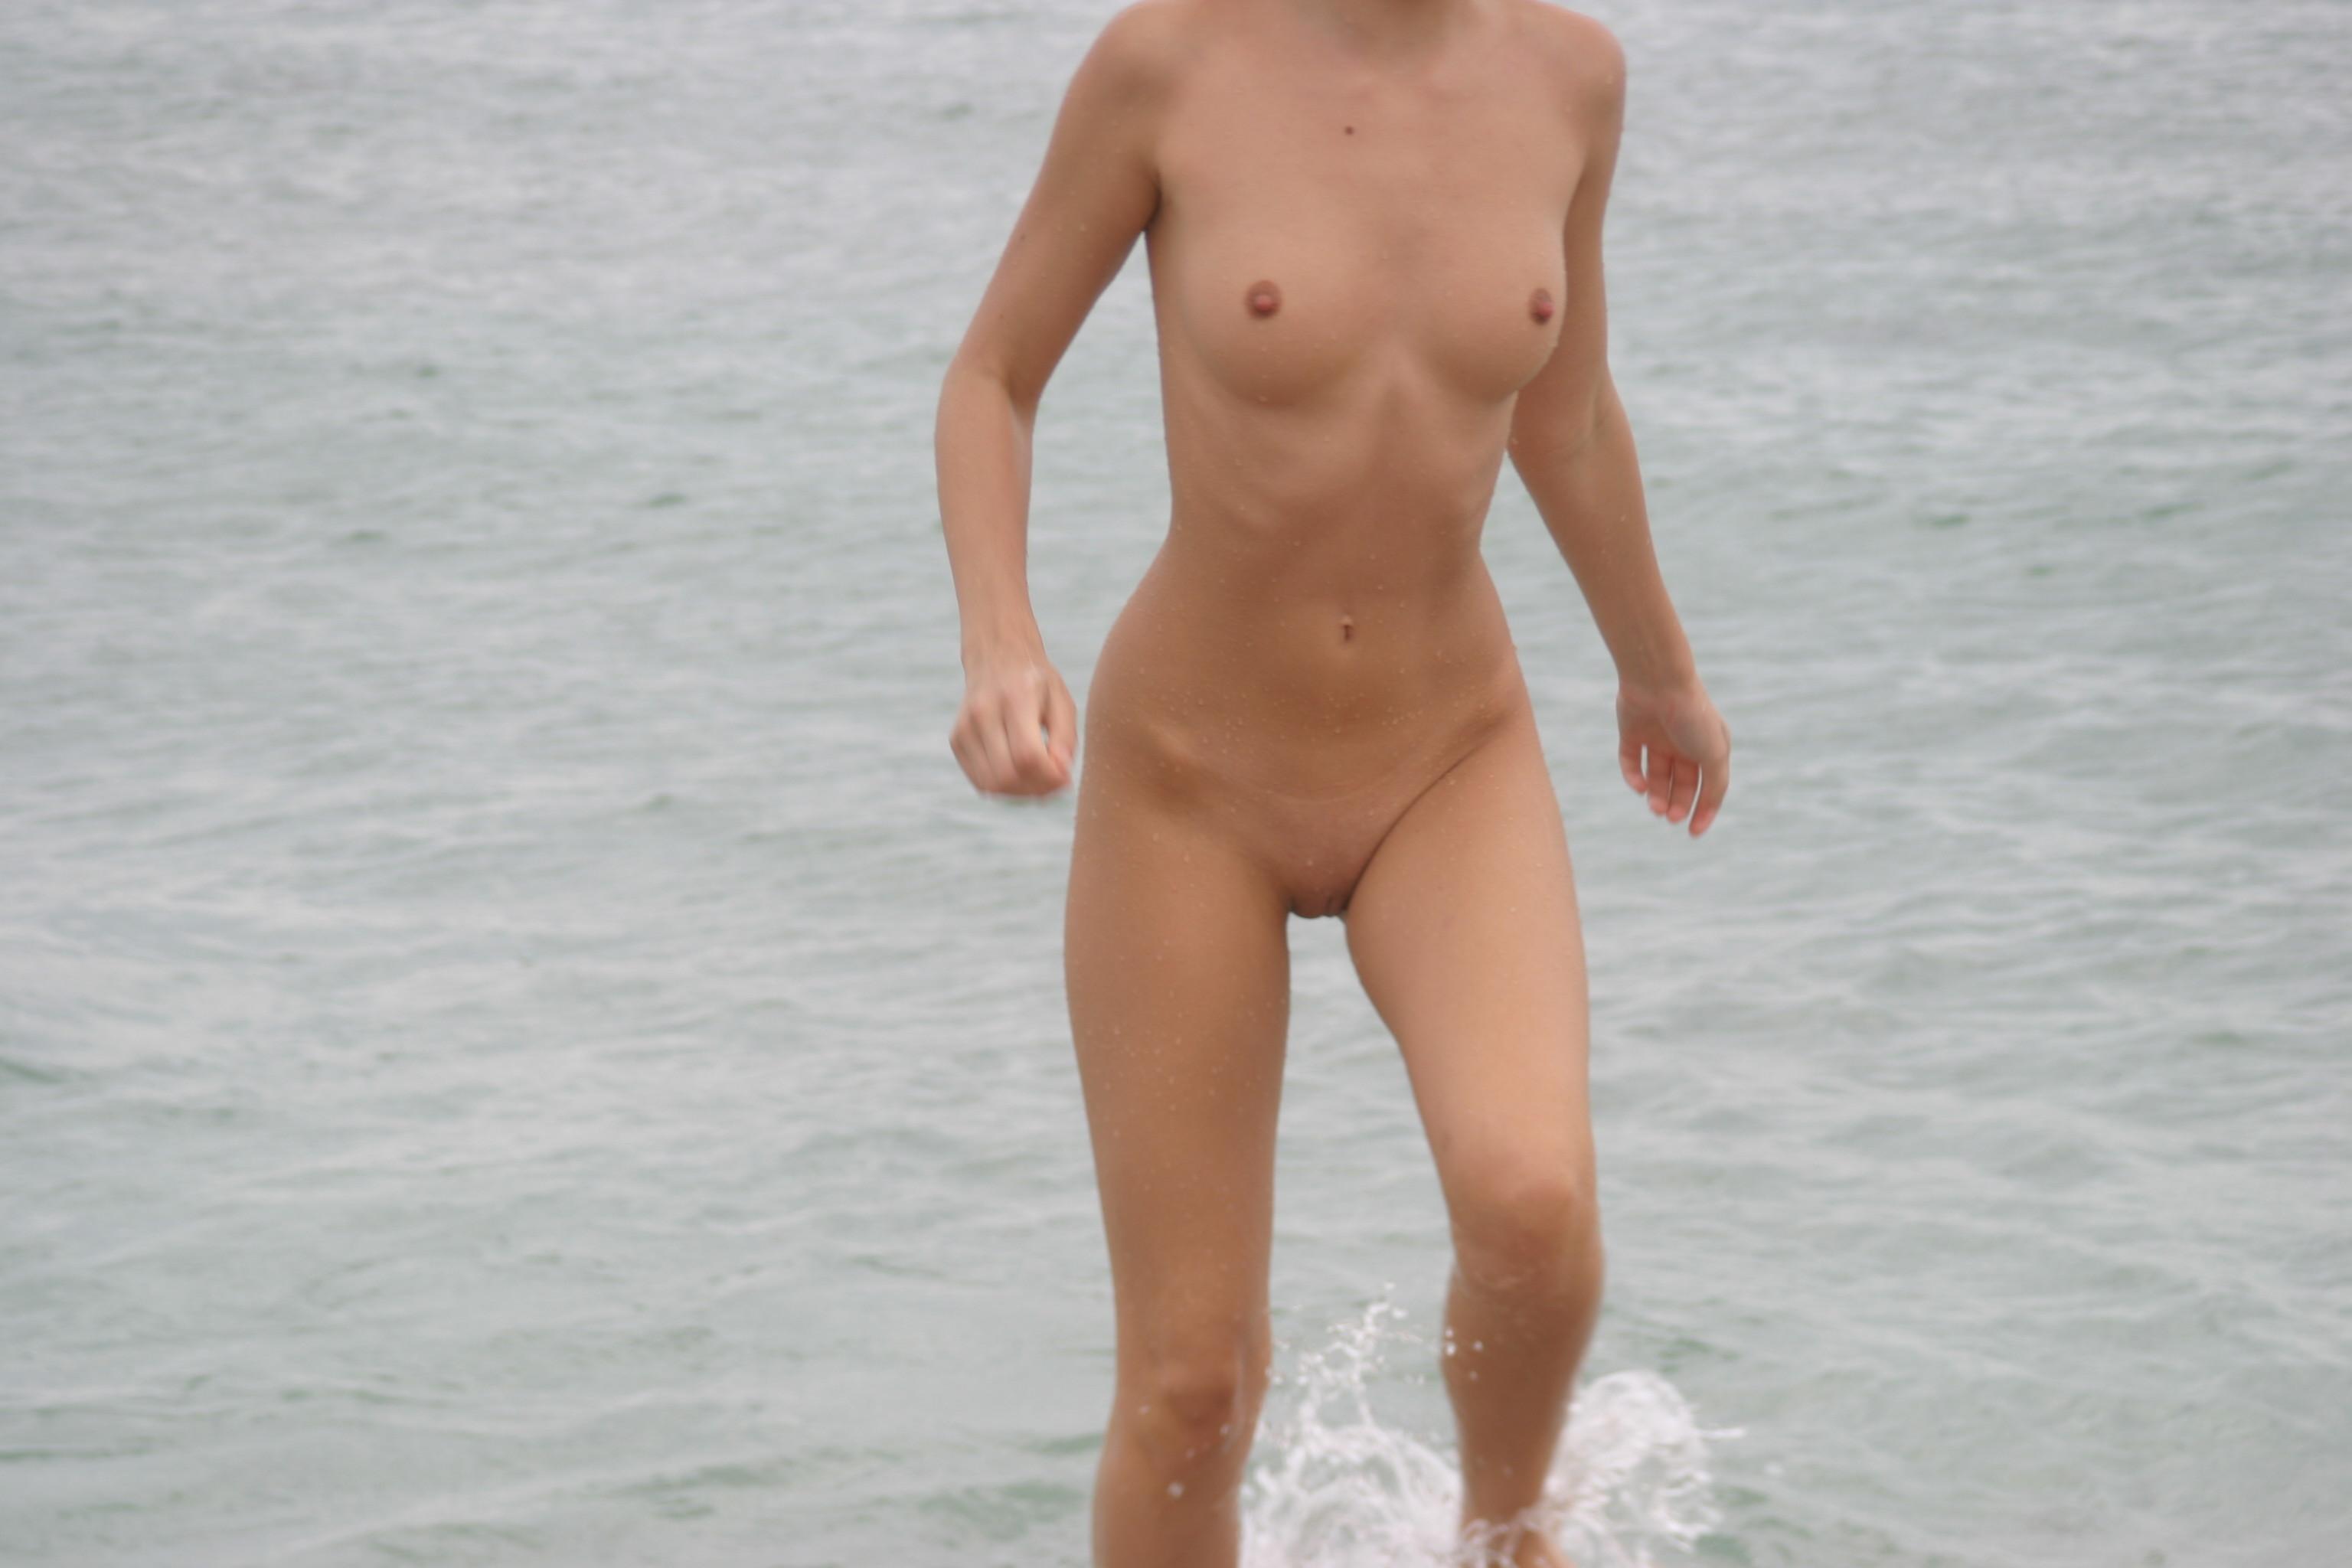 vika-y-lena-l-beach-nude-in-public-metart-03